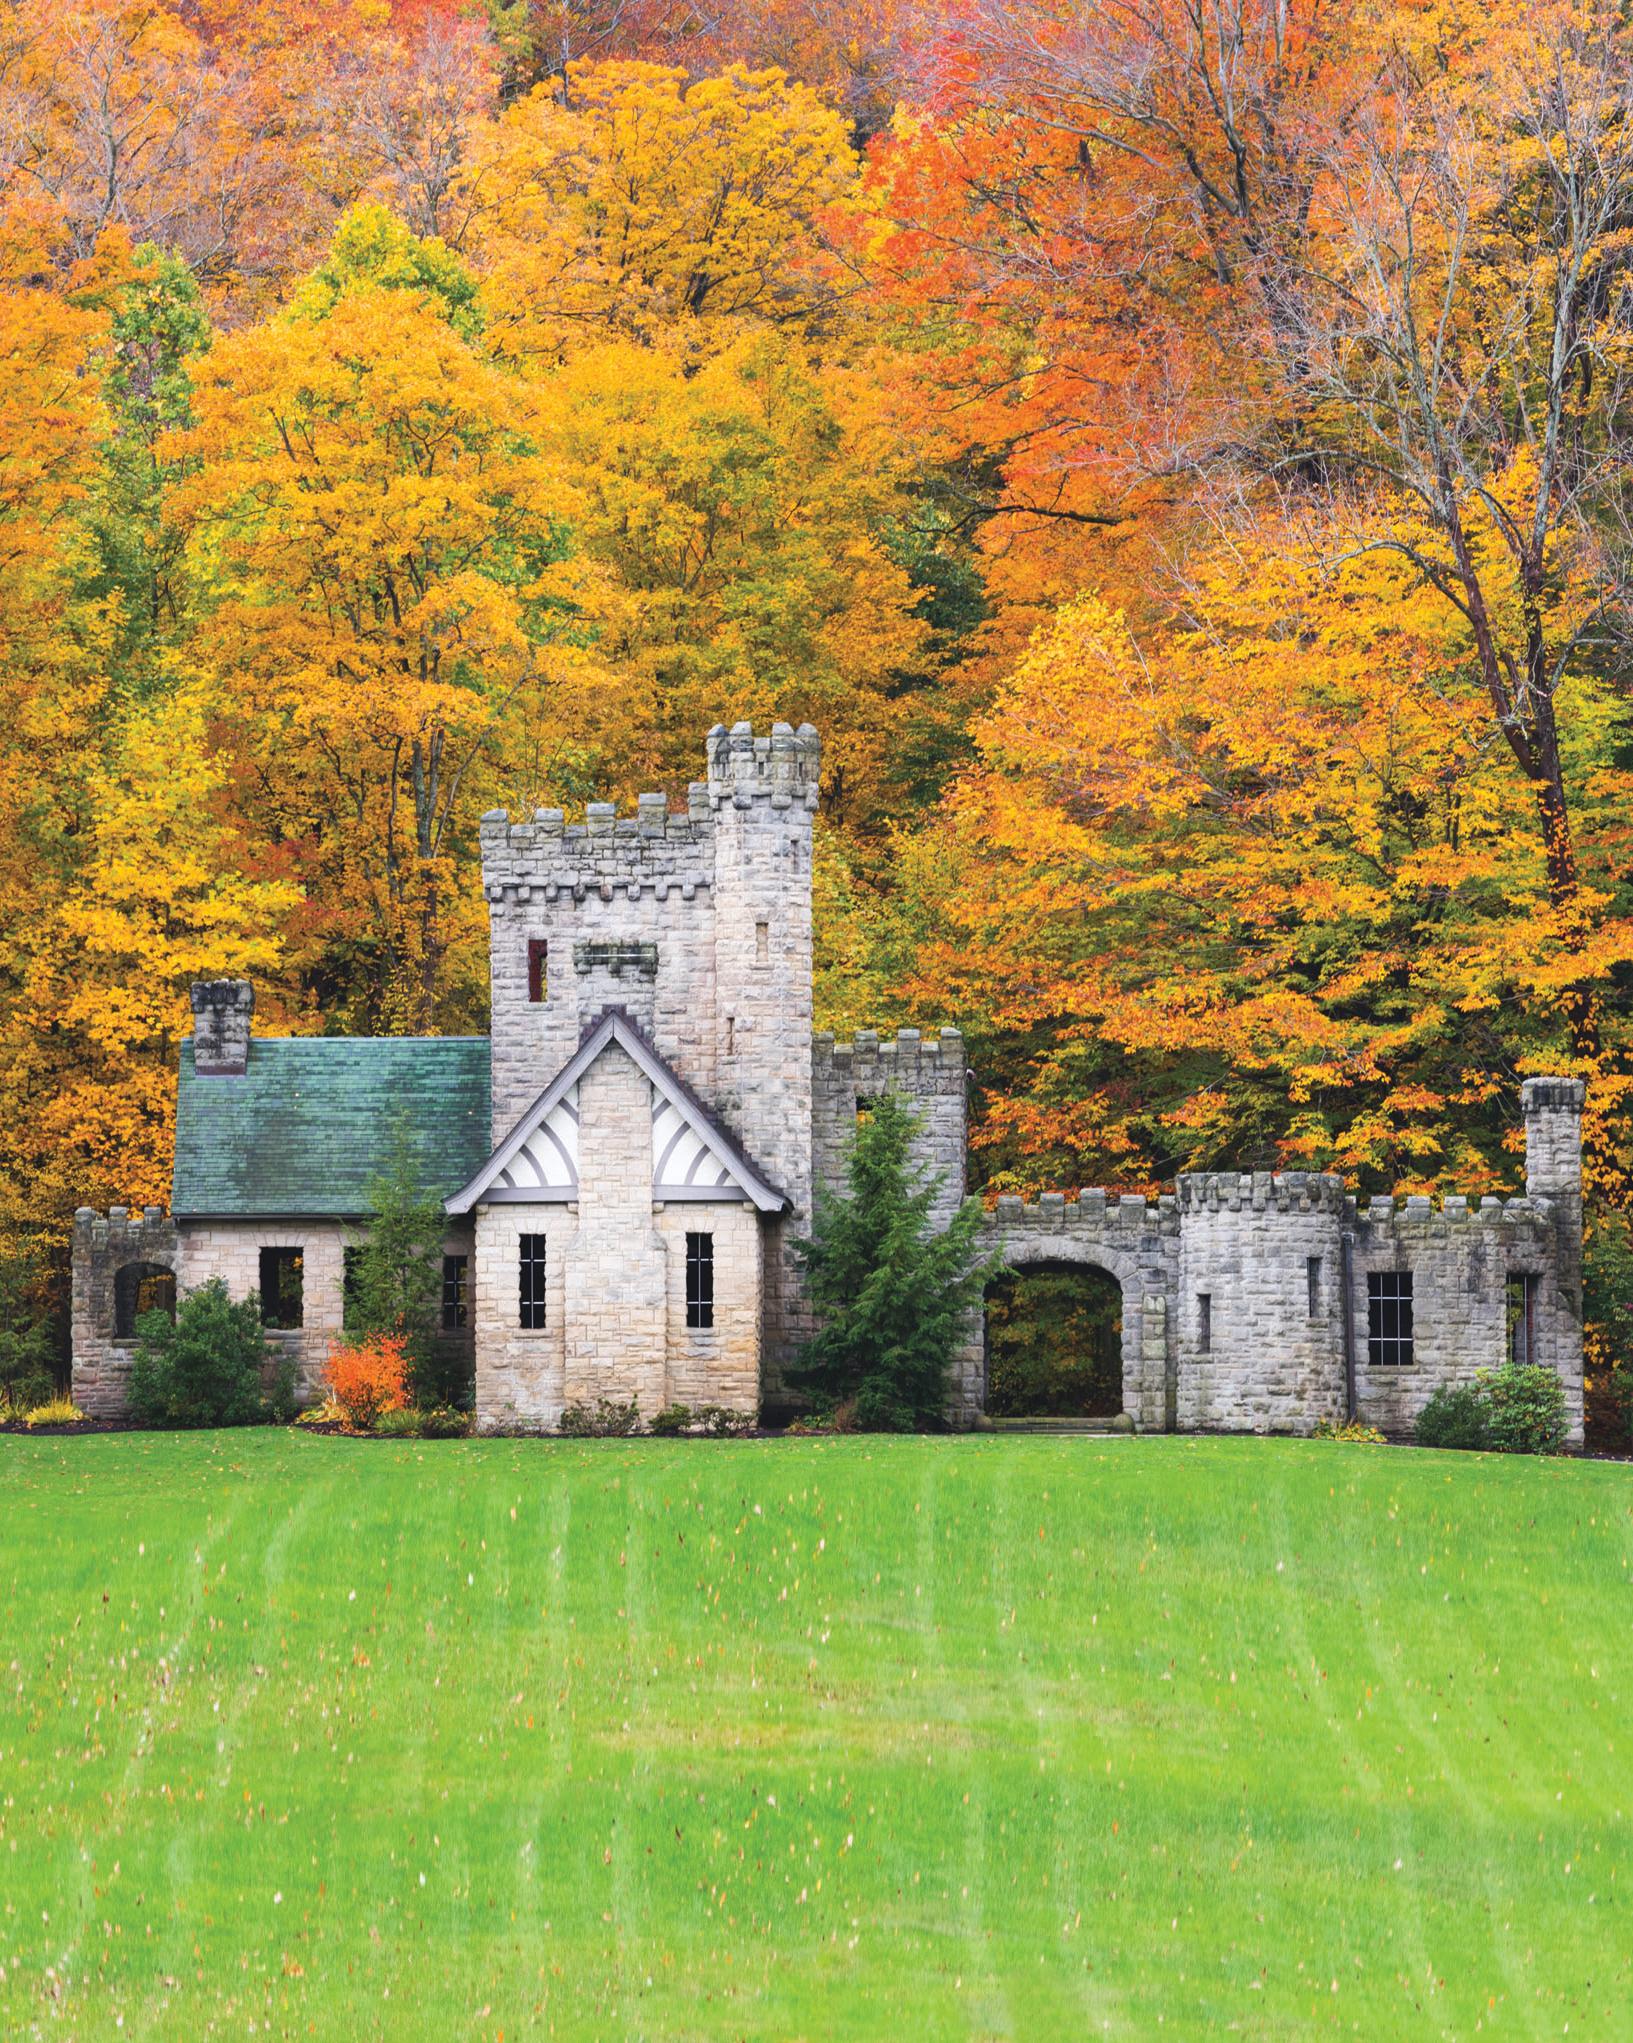 castle-wedding-venues-squires-cleveland-0115.jpg